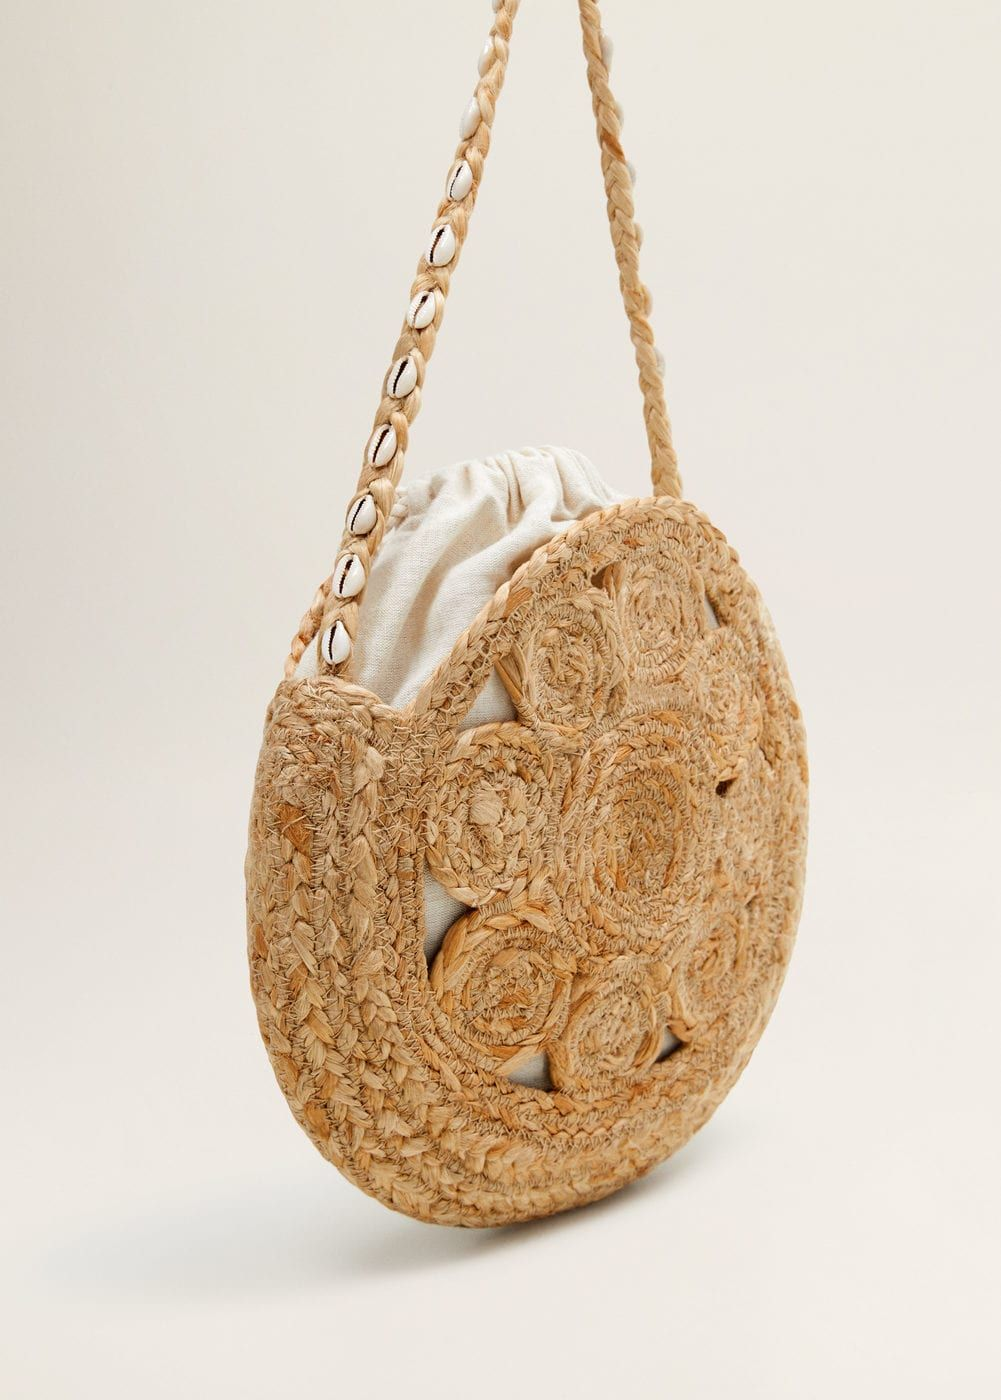 1630a23d0 Round jute bag - Women in 2019 | Bolso | Jute bags, Bags, Jute